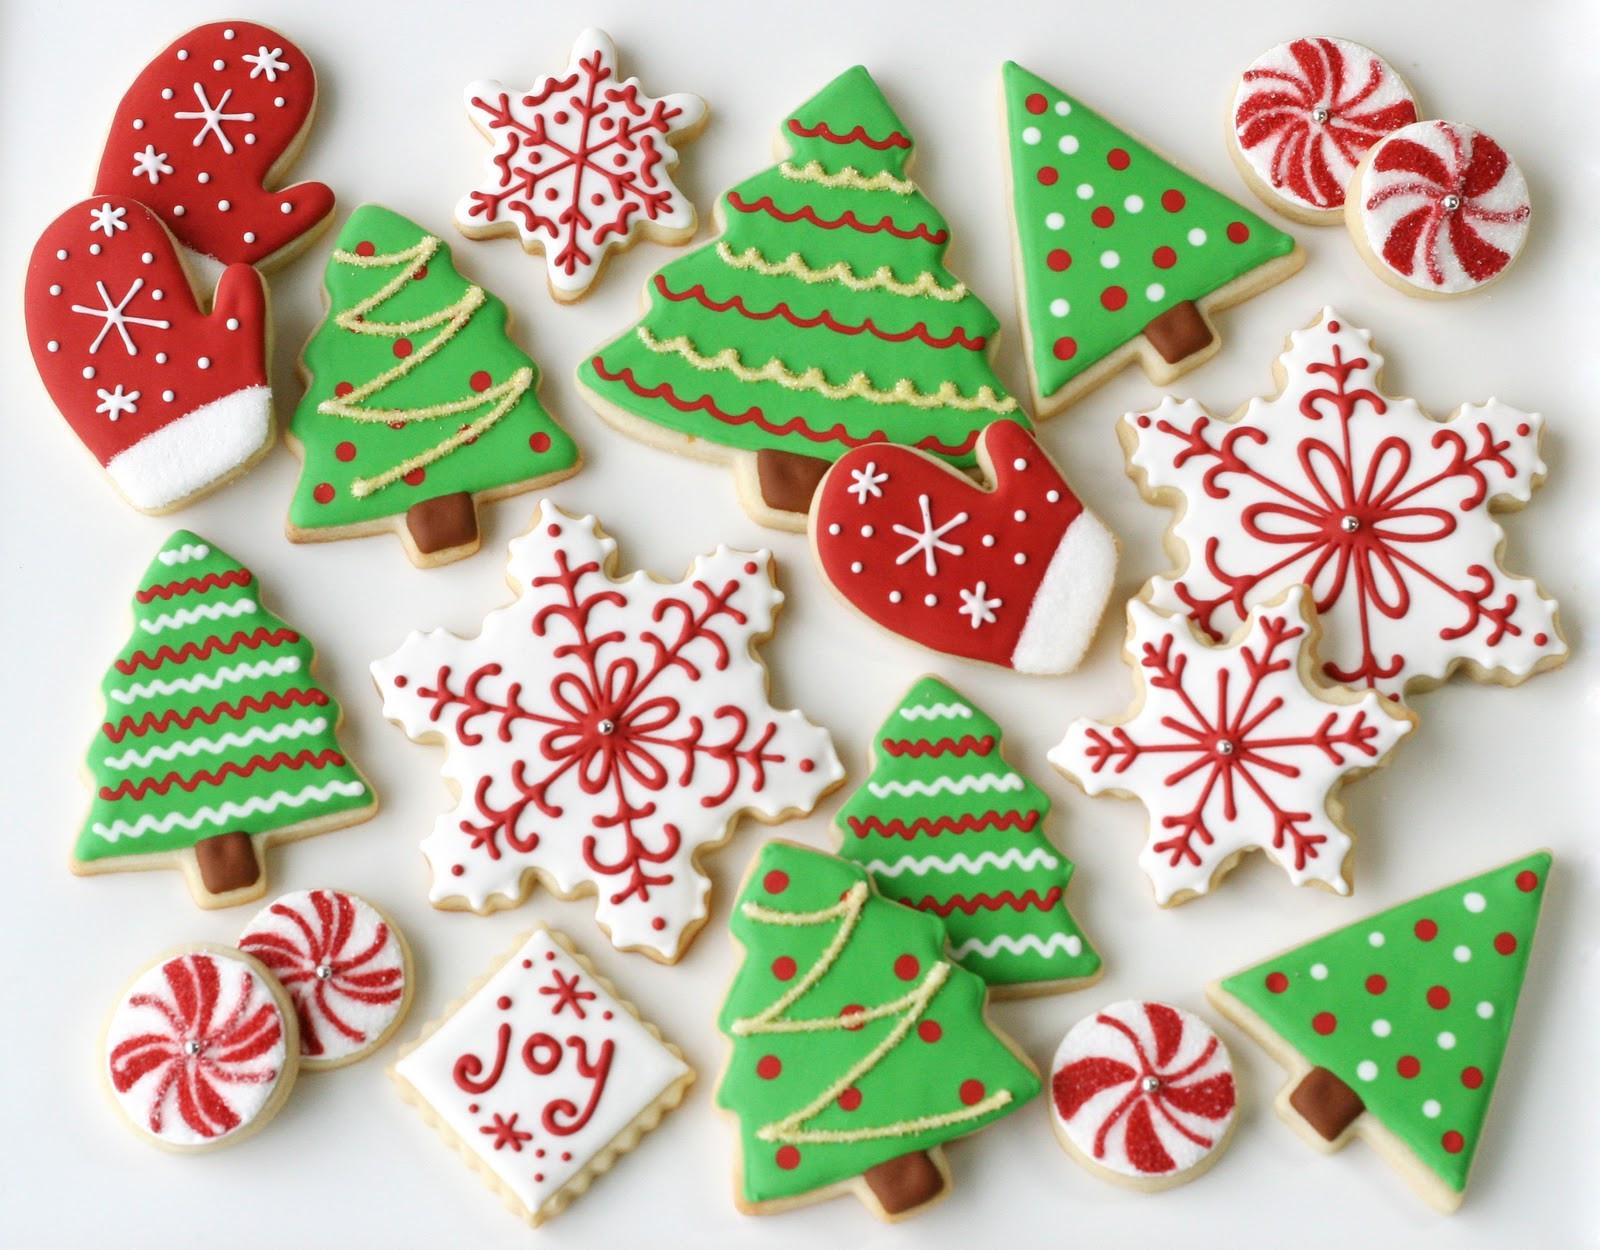 Christmas Cutout Cookies  Christmas Cookies Galore Glorious Treats